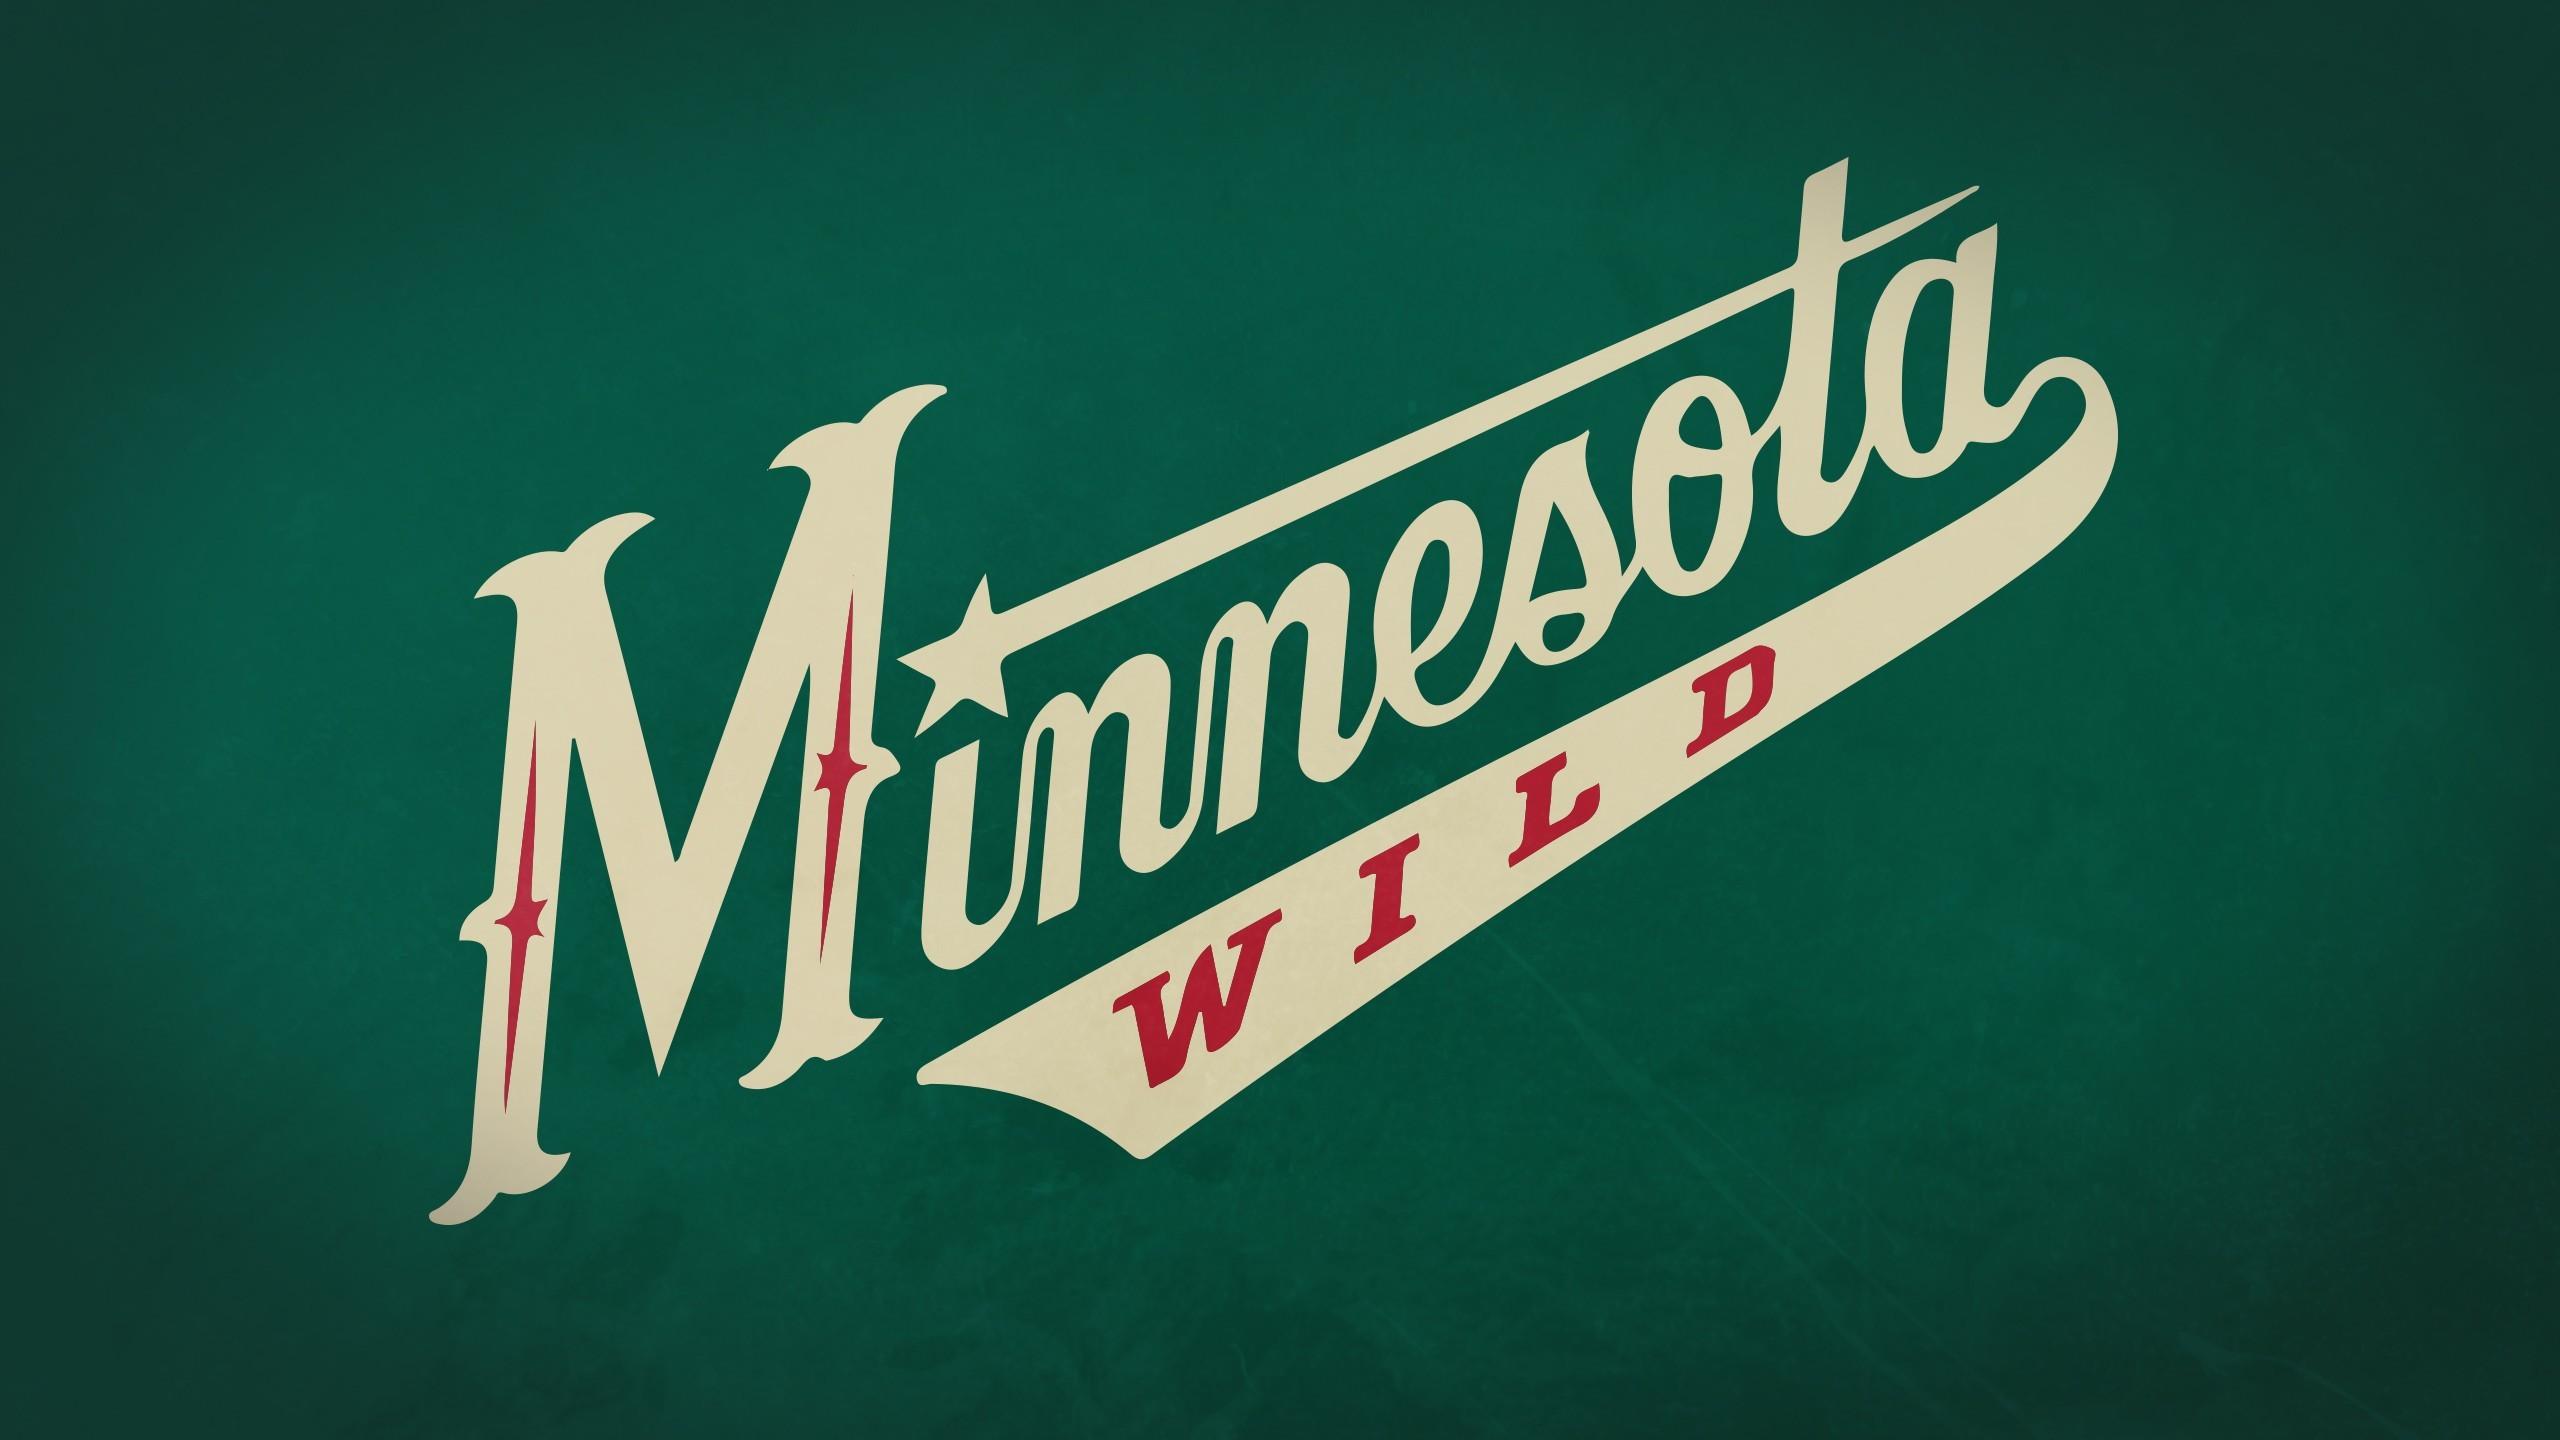 Sports Minnesota Wild Wallpaper #359420 – Resolution px